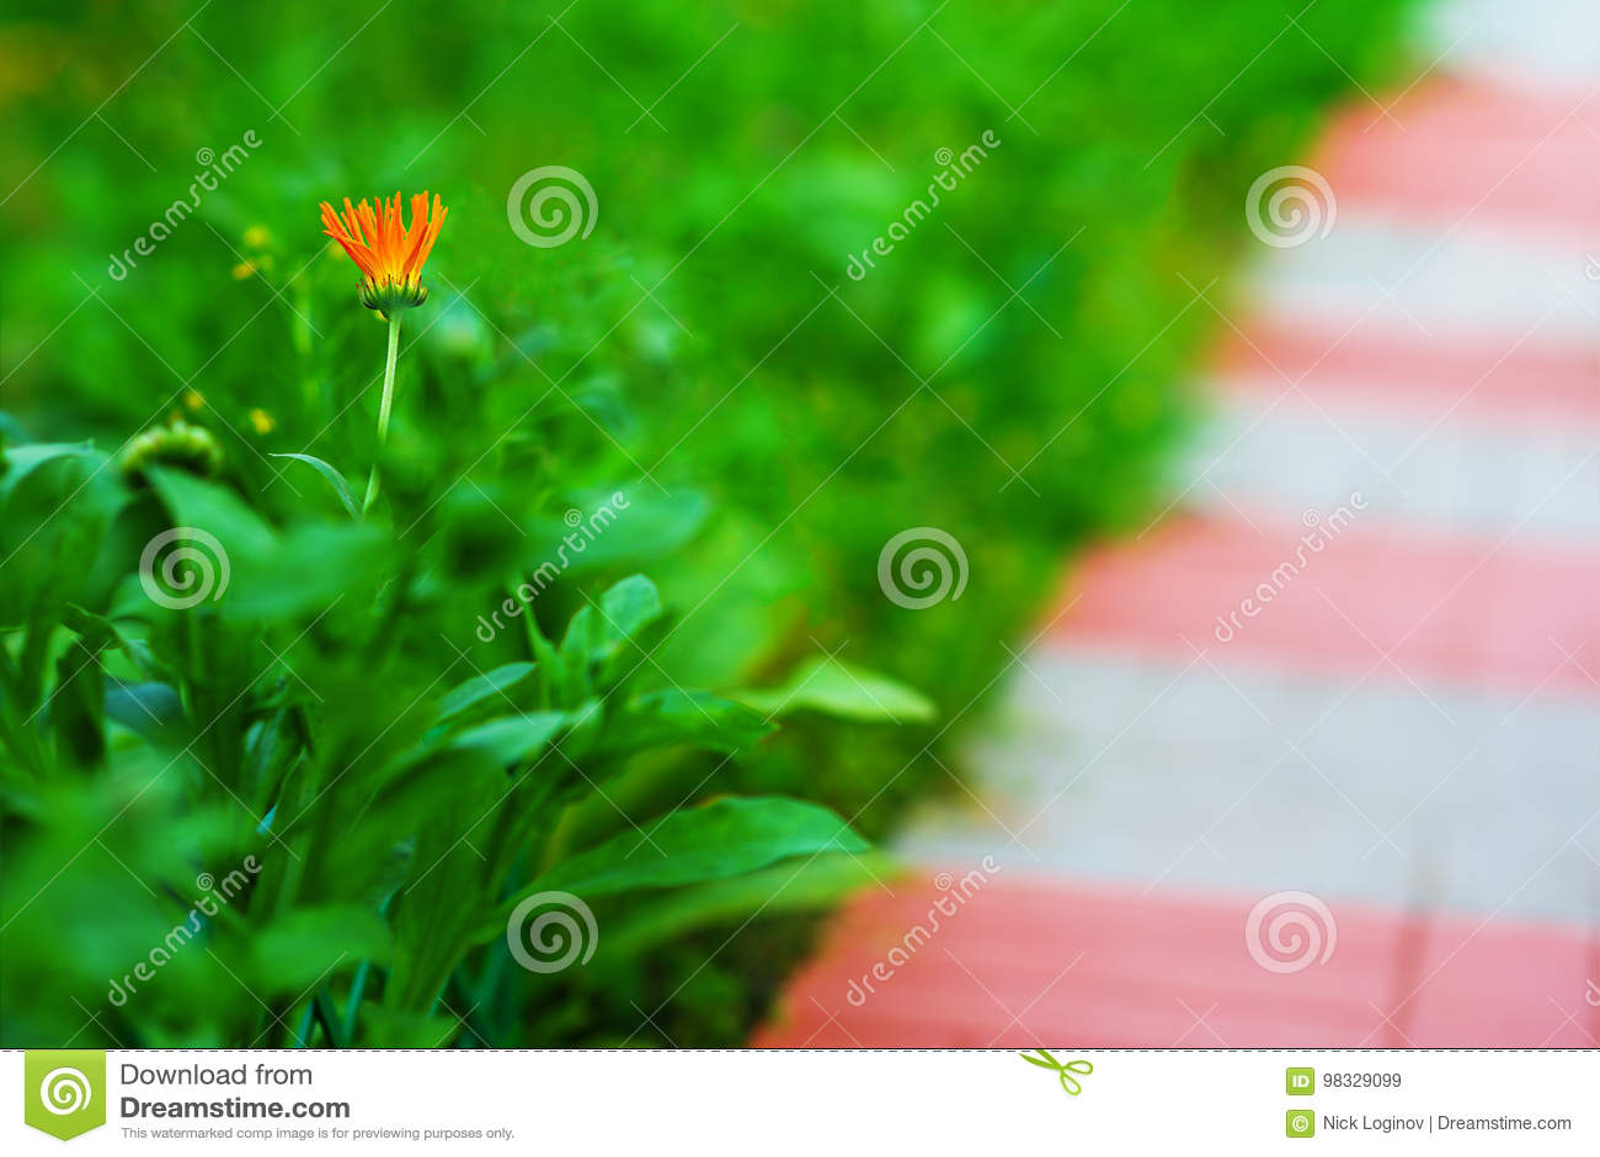 Diagonal Path With Left Aligned Orange Flower Background